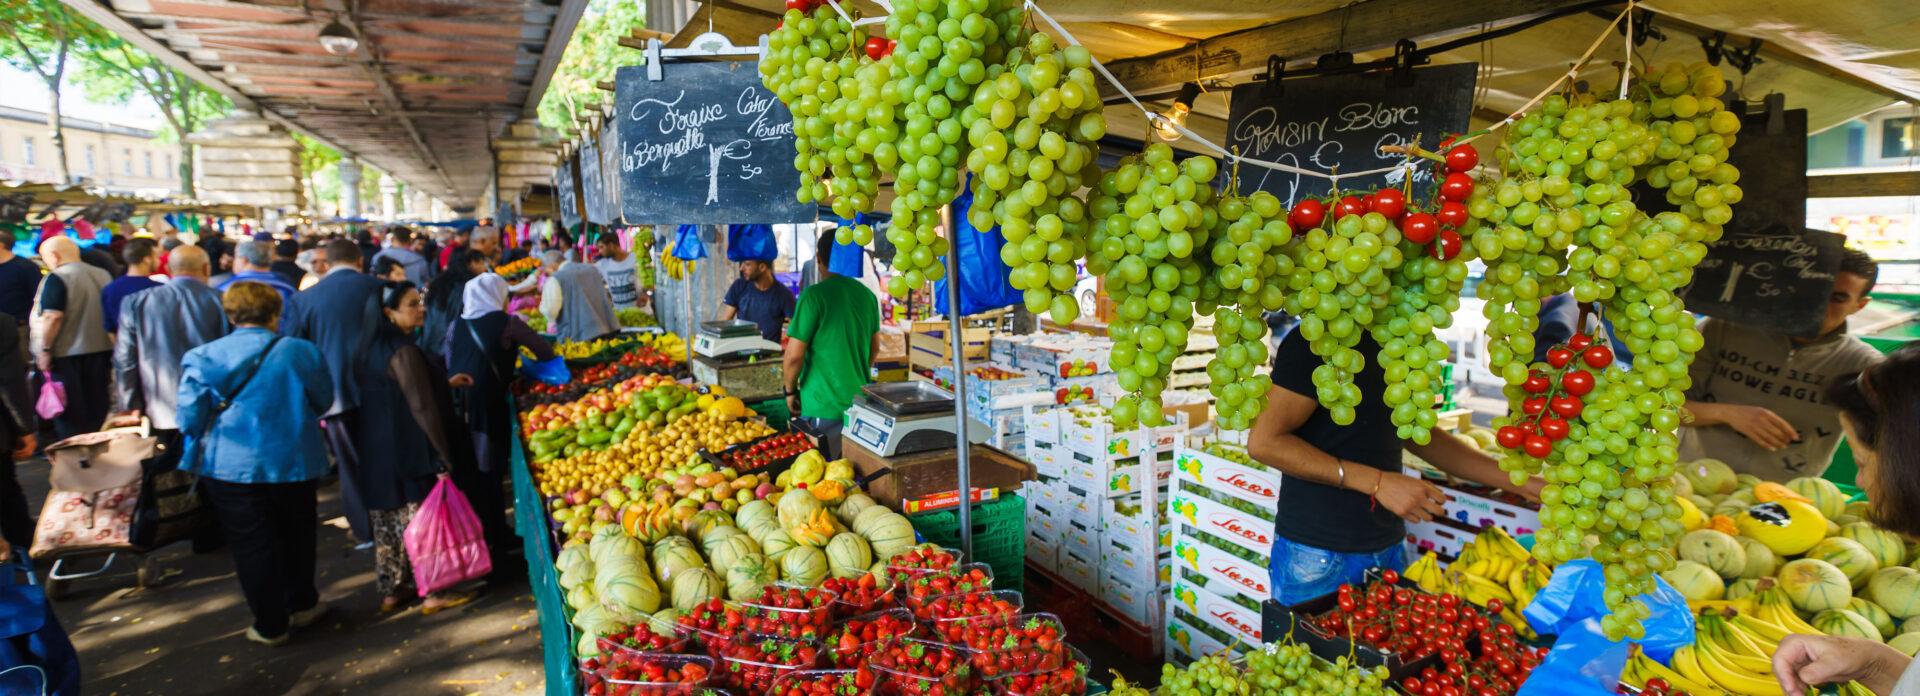 Matmarked Paris tips anbefalt de beste marked frukt